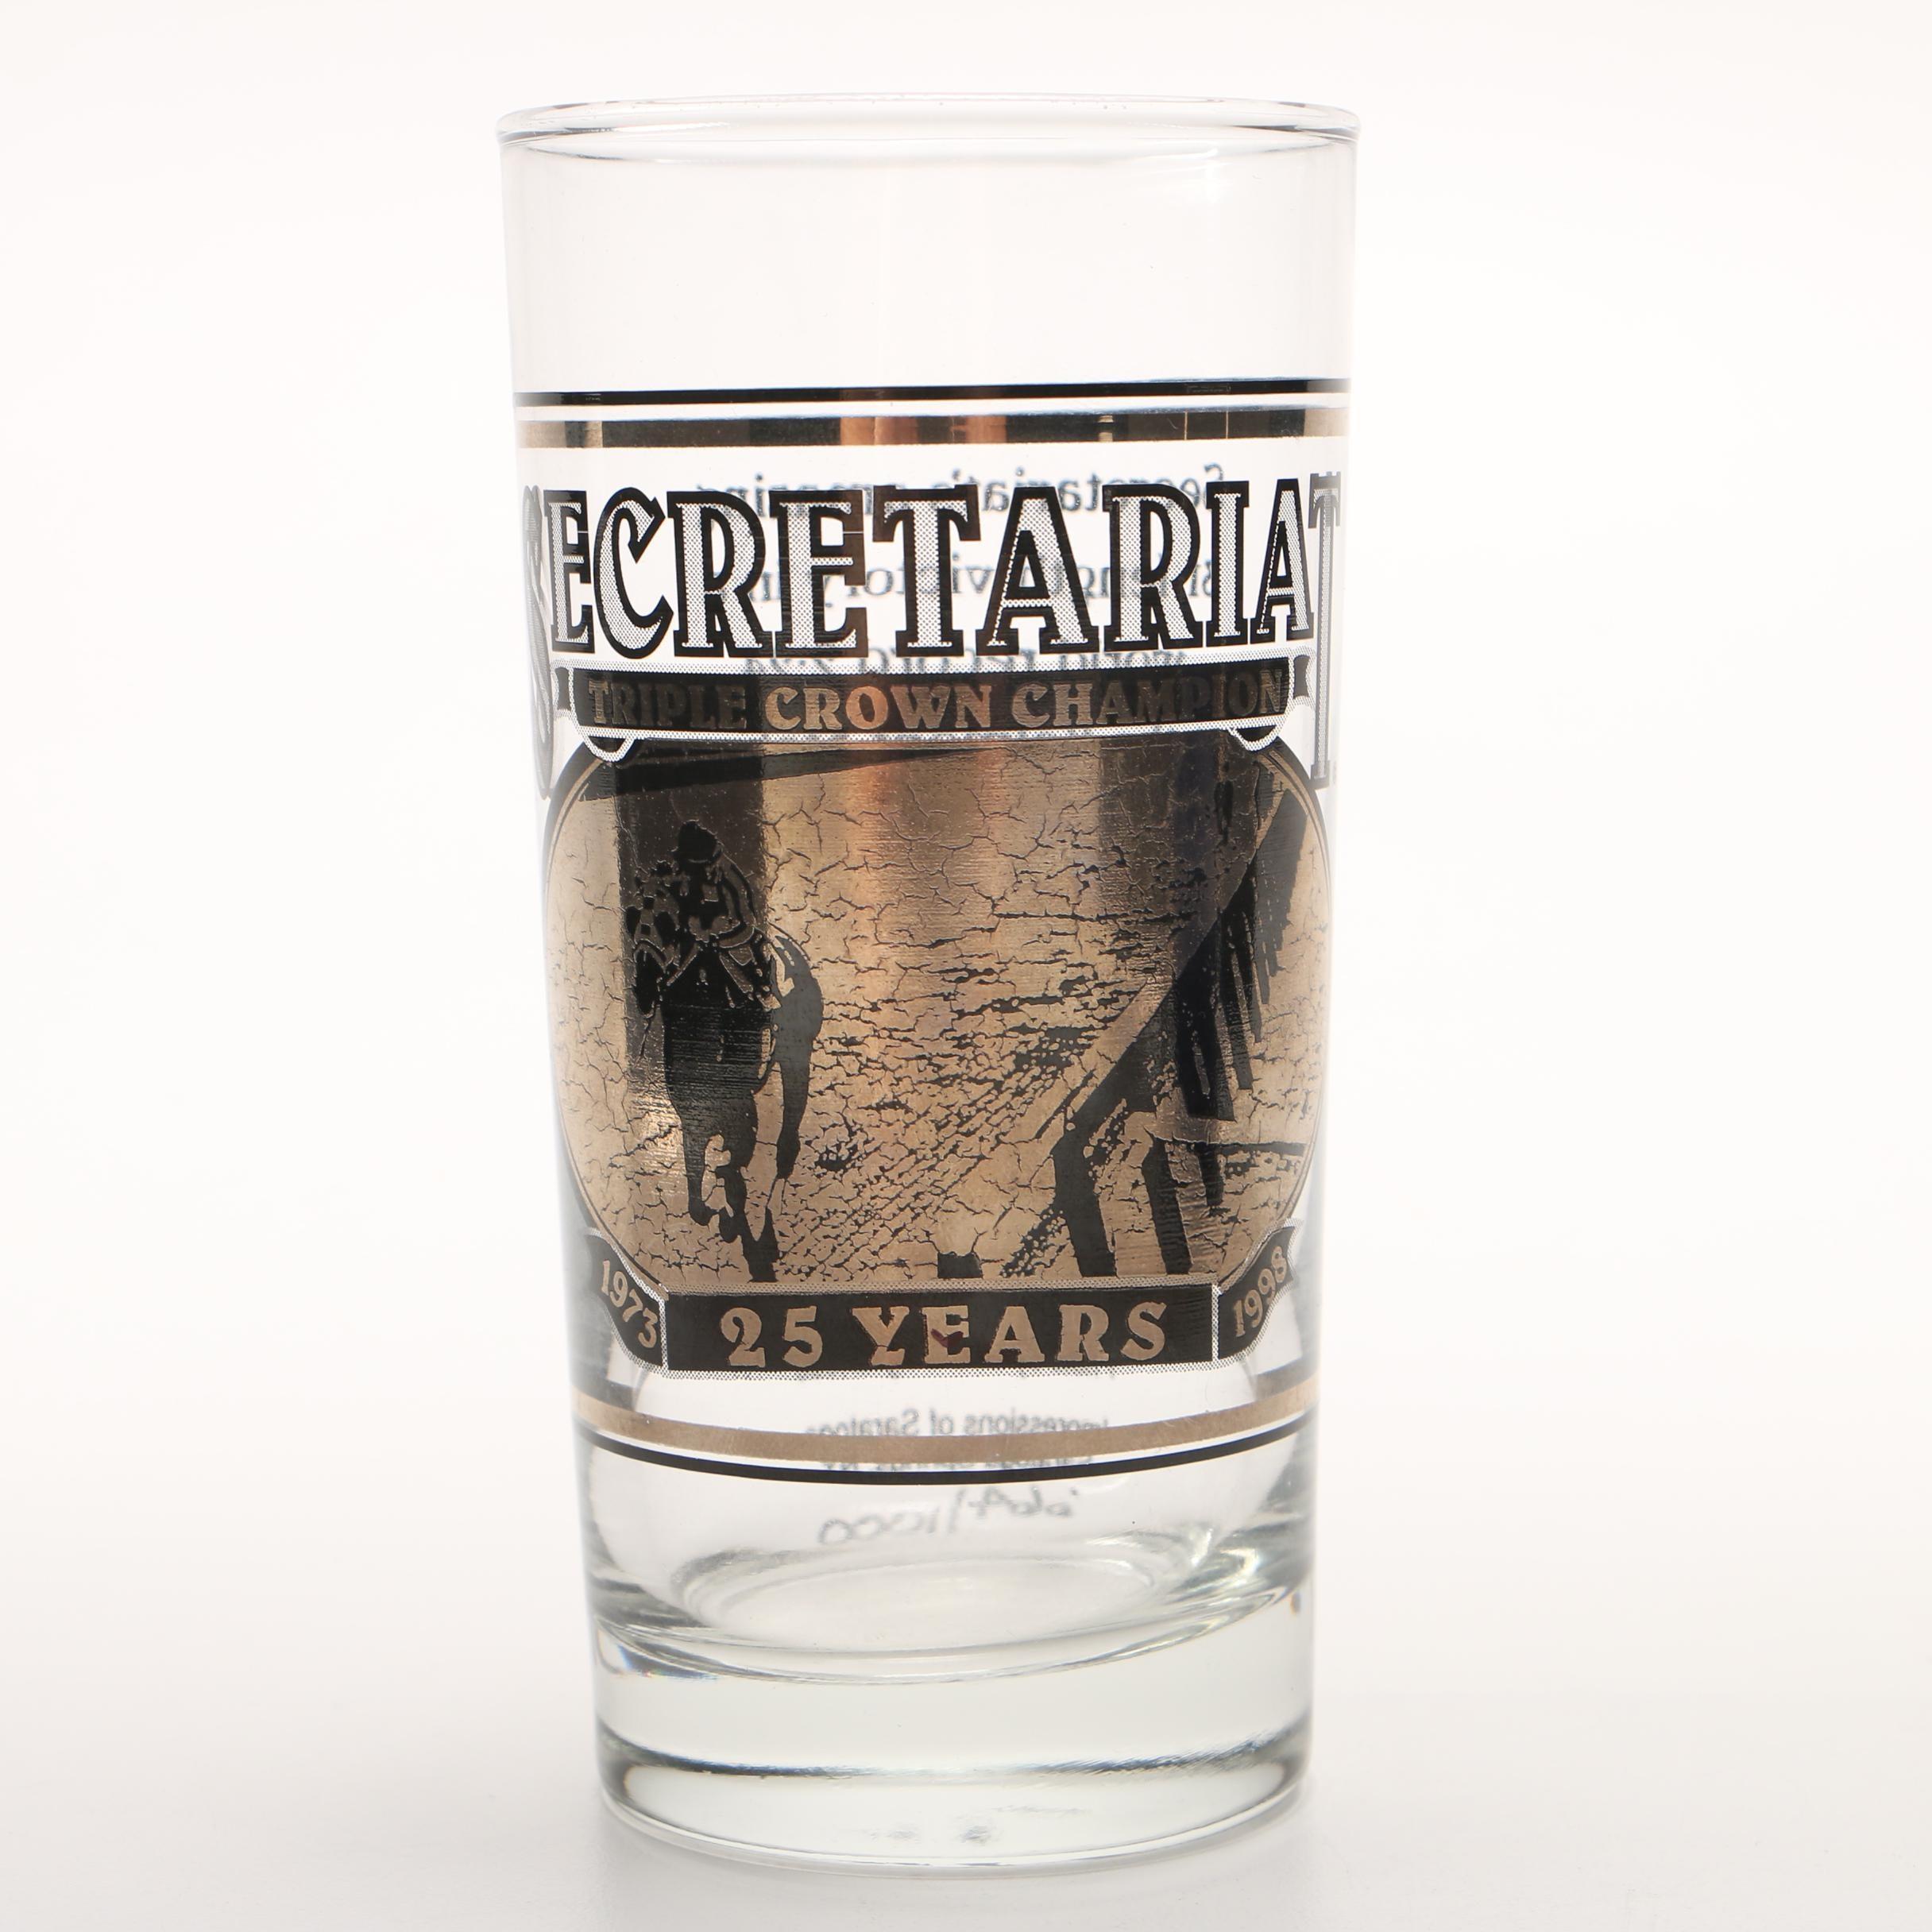 Limited Edition 25th Anniversary Commemorative Secretariat Belmont Stakes Glass